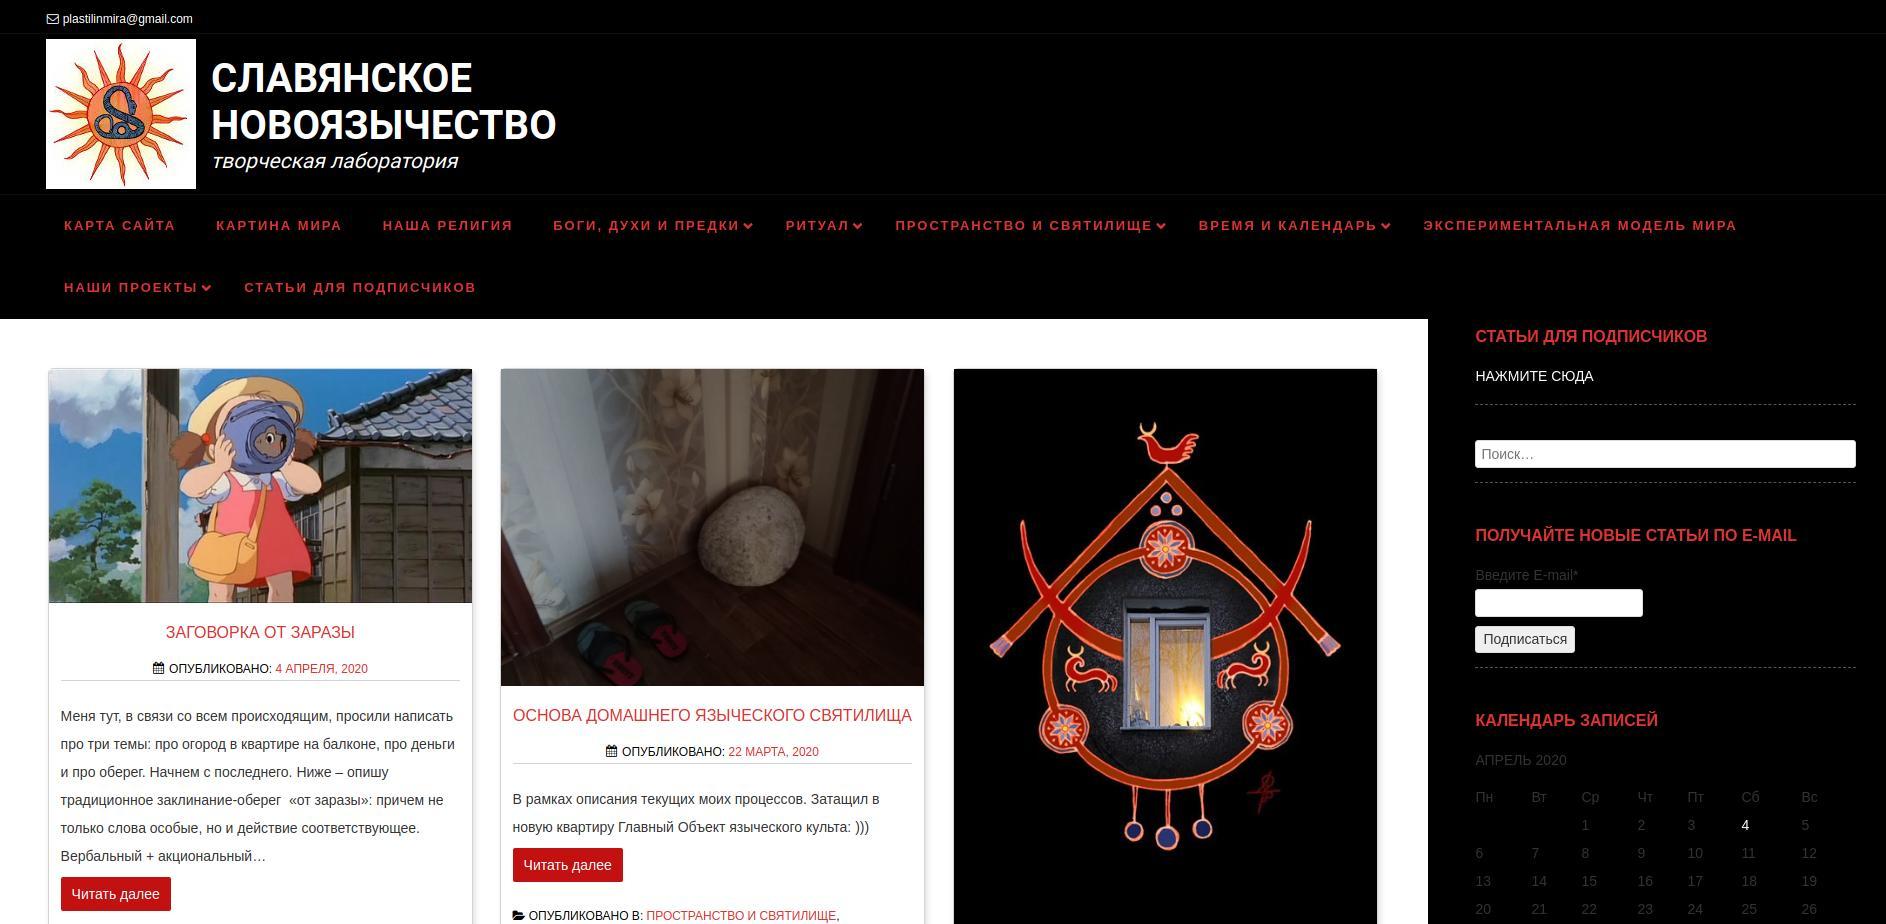 Slavic neopaganism website